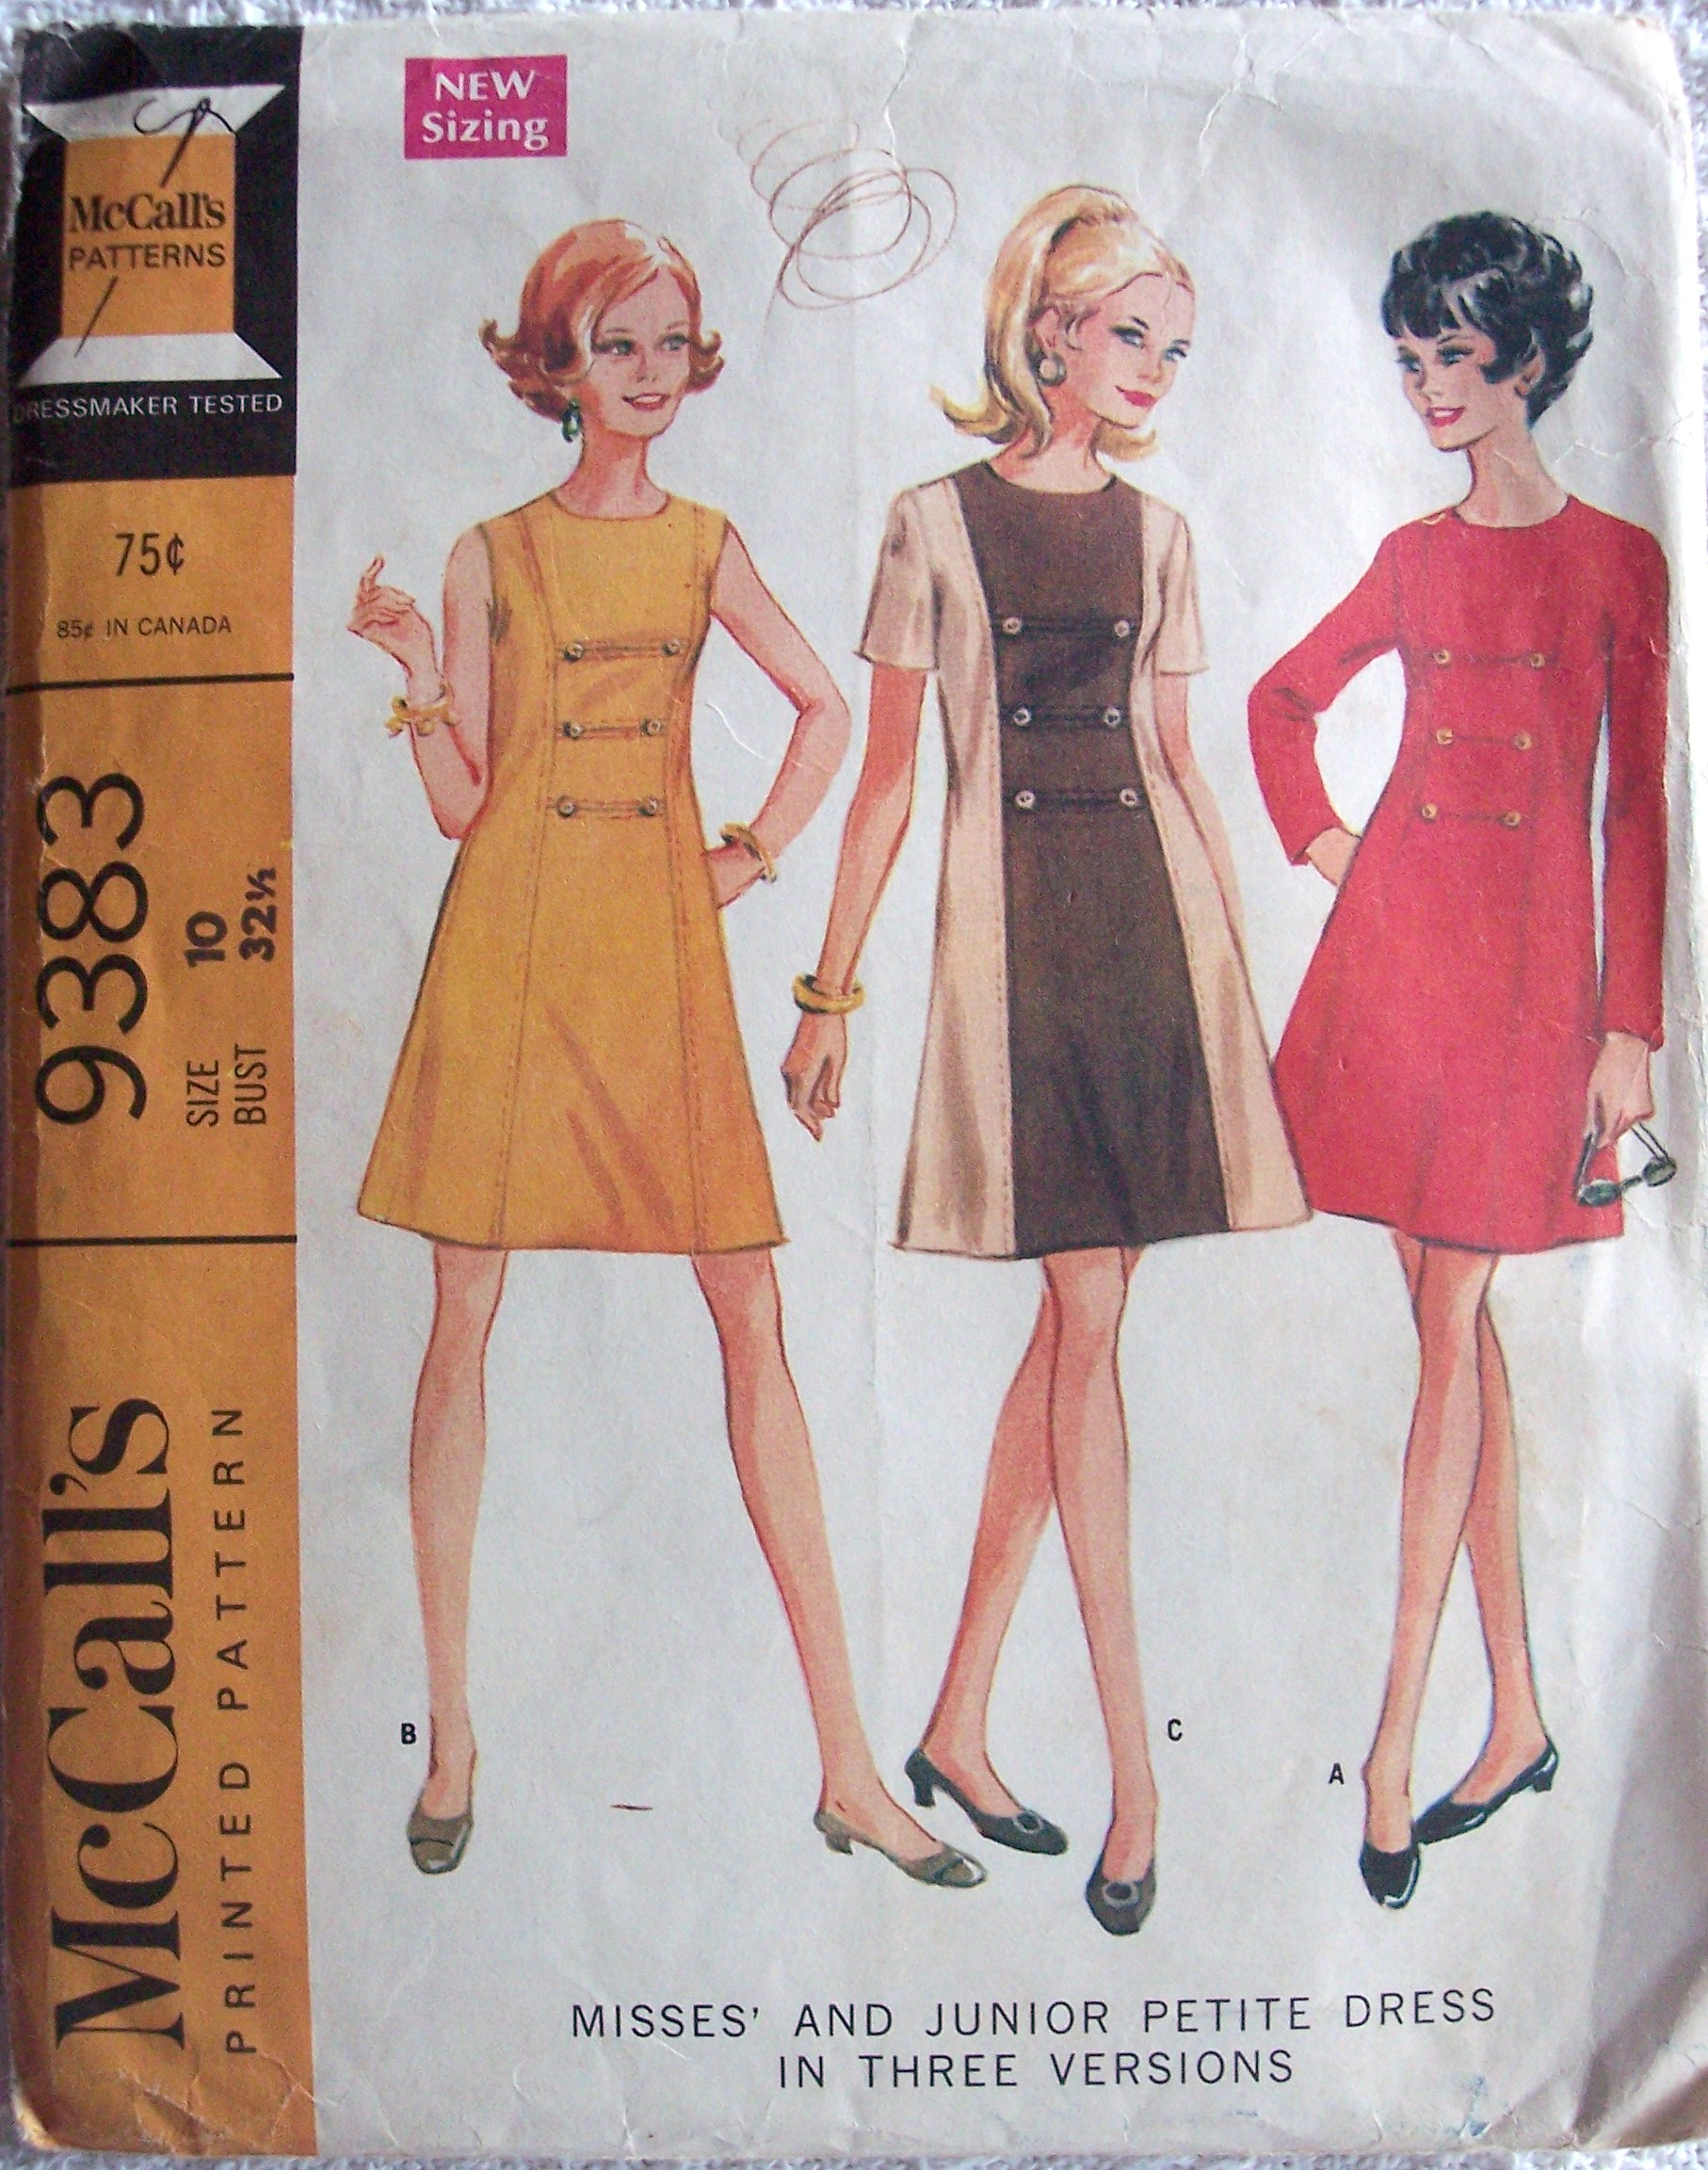 McCall's 9383 A